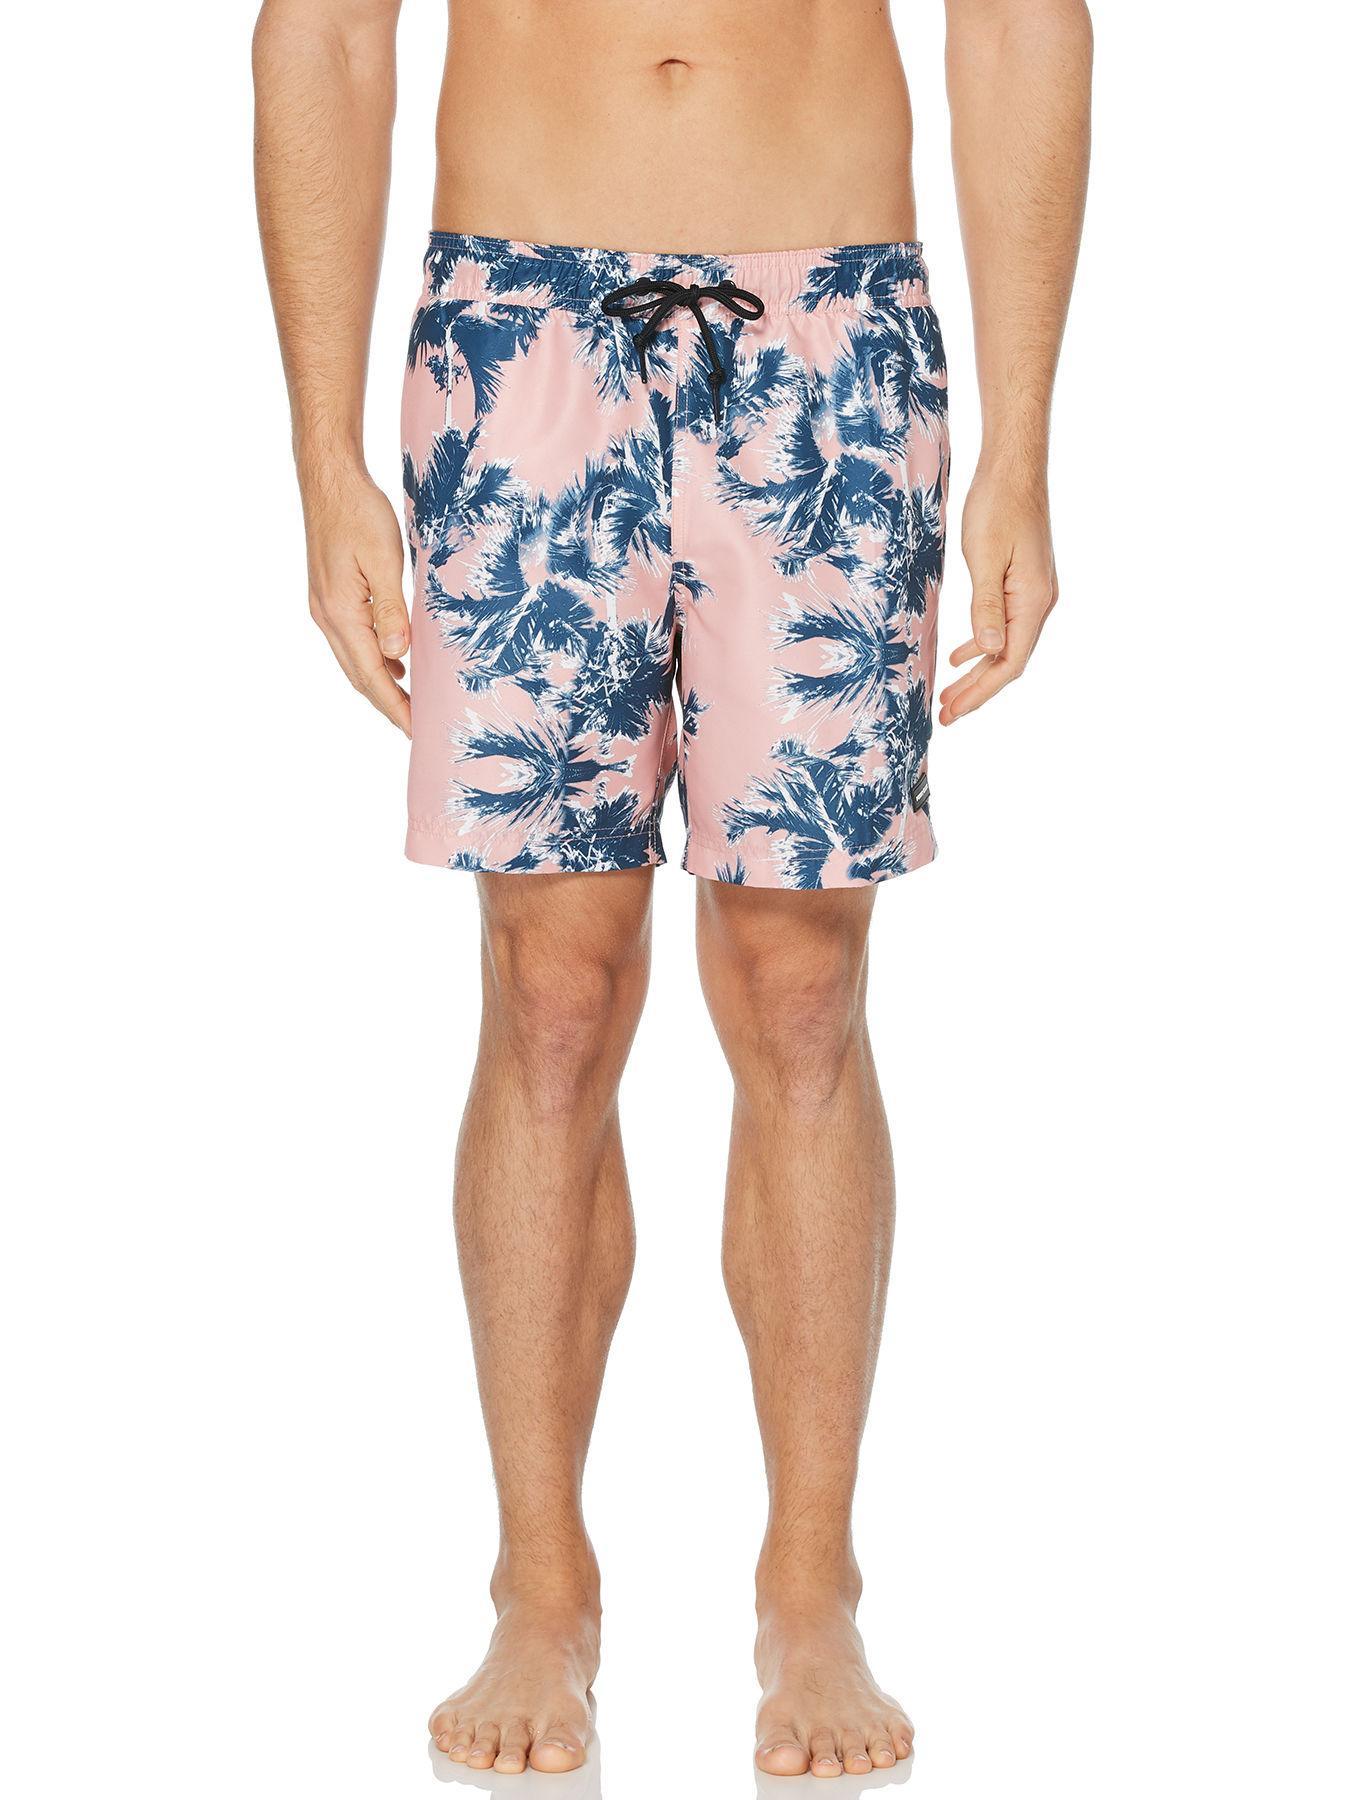 3c466adbd3 Lyst - Perry Ellis Palm Tree Print Swim Short in Blue for Men